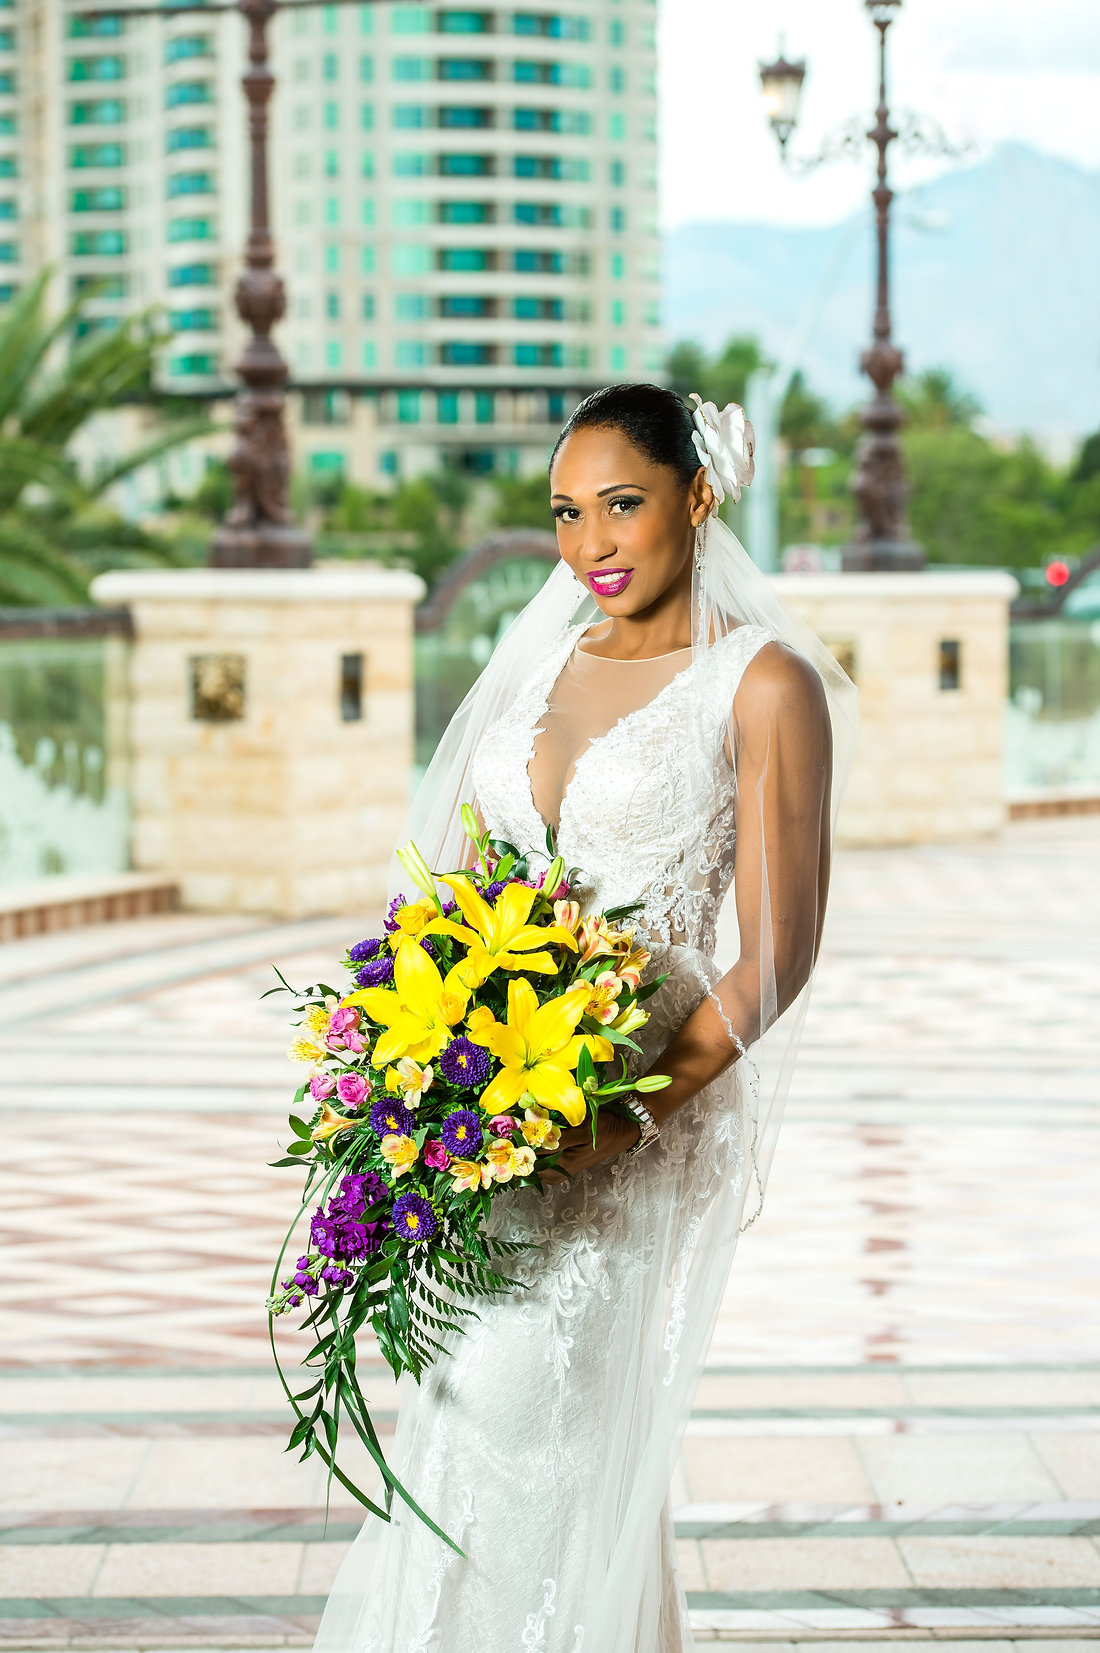 Layers of Luxe Wedding Magazine, Las Vegas Weddings, Destination Weddings